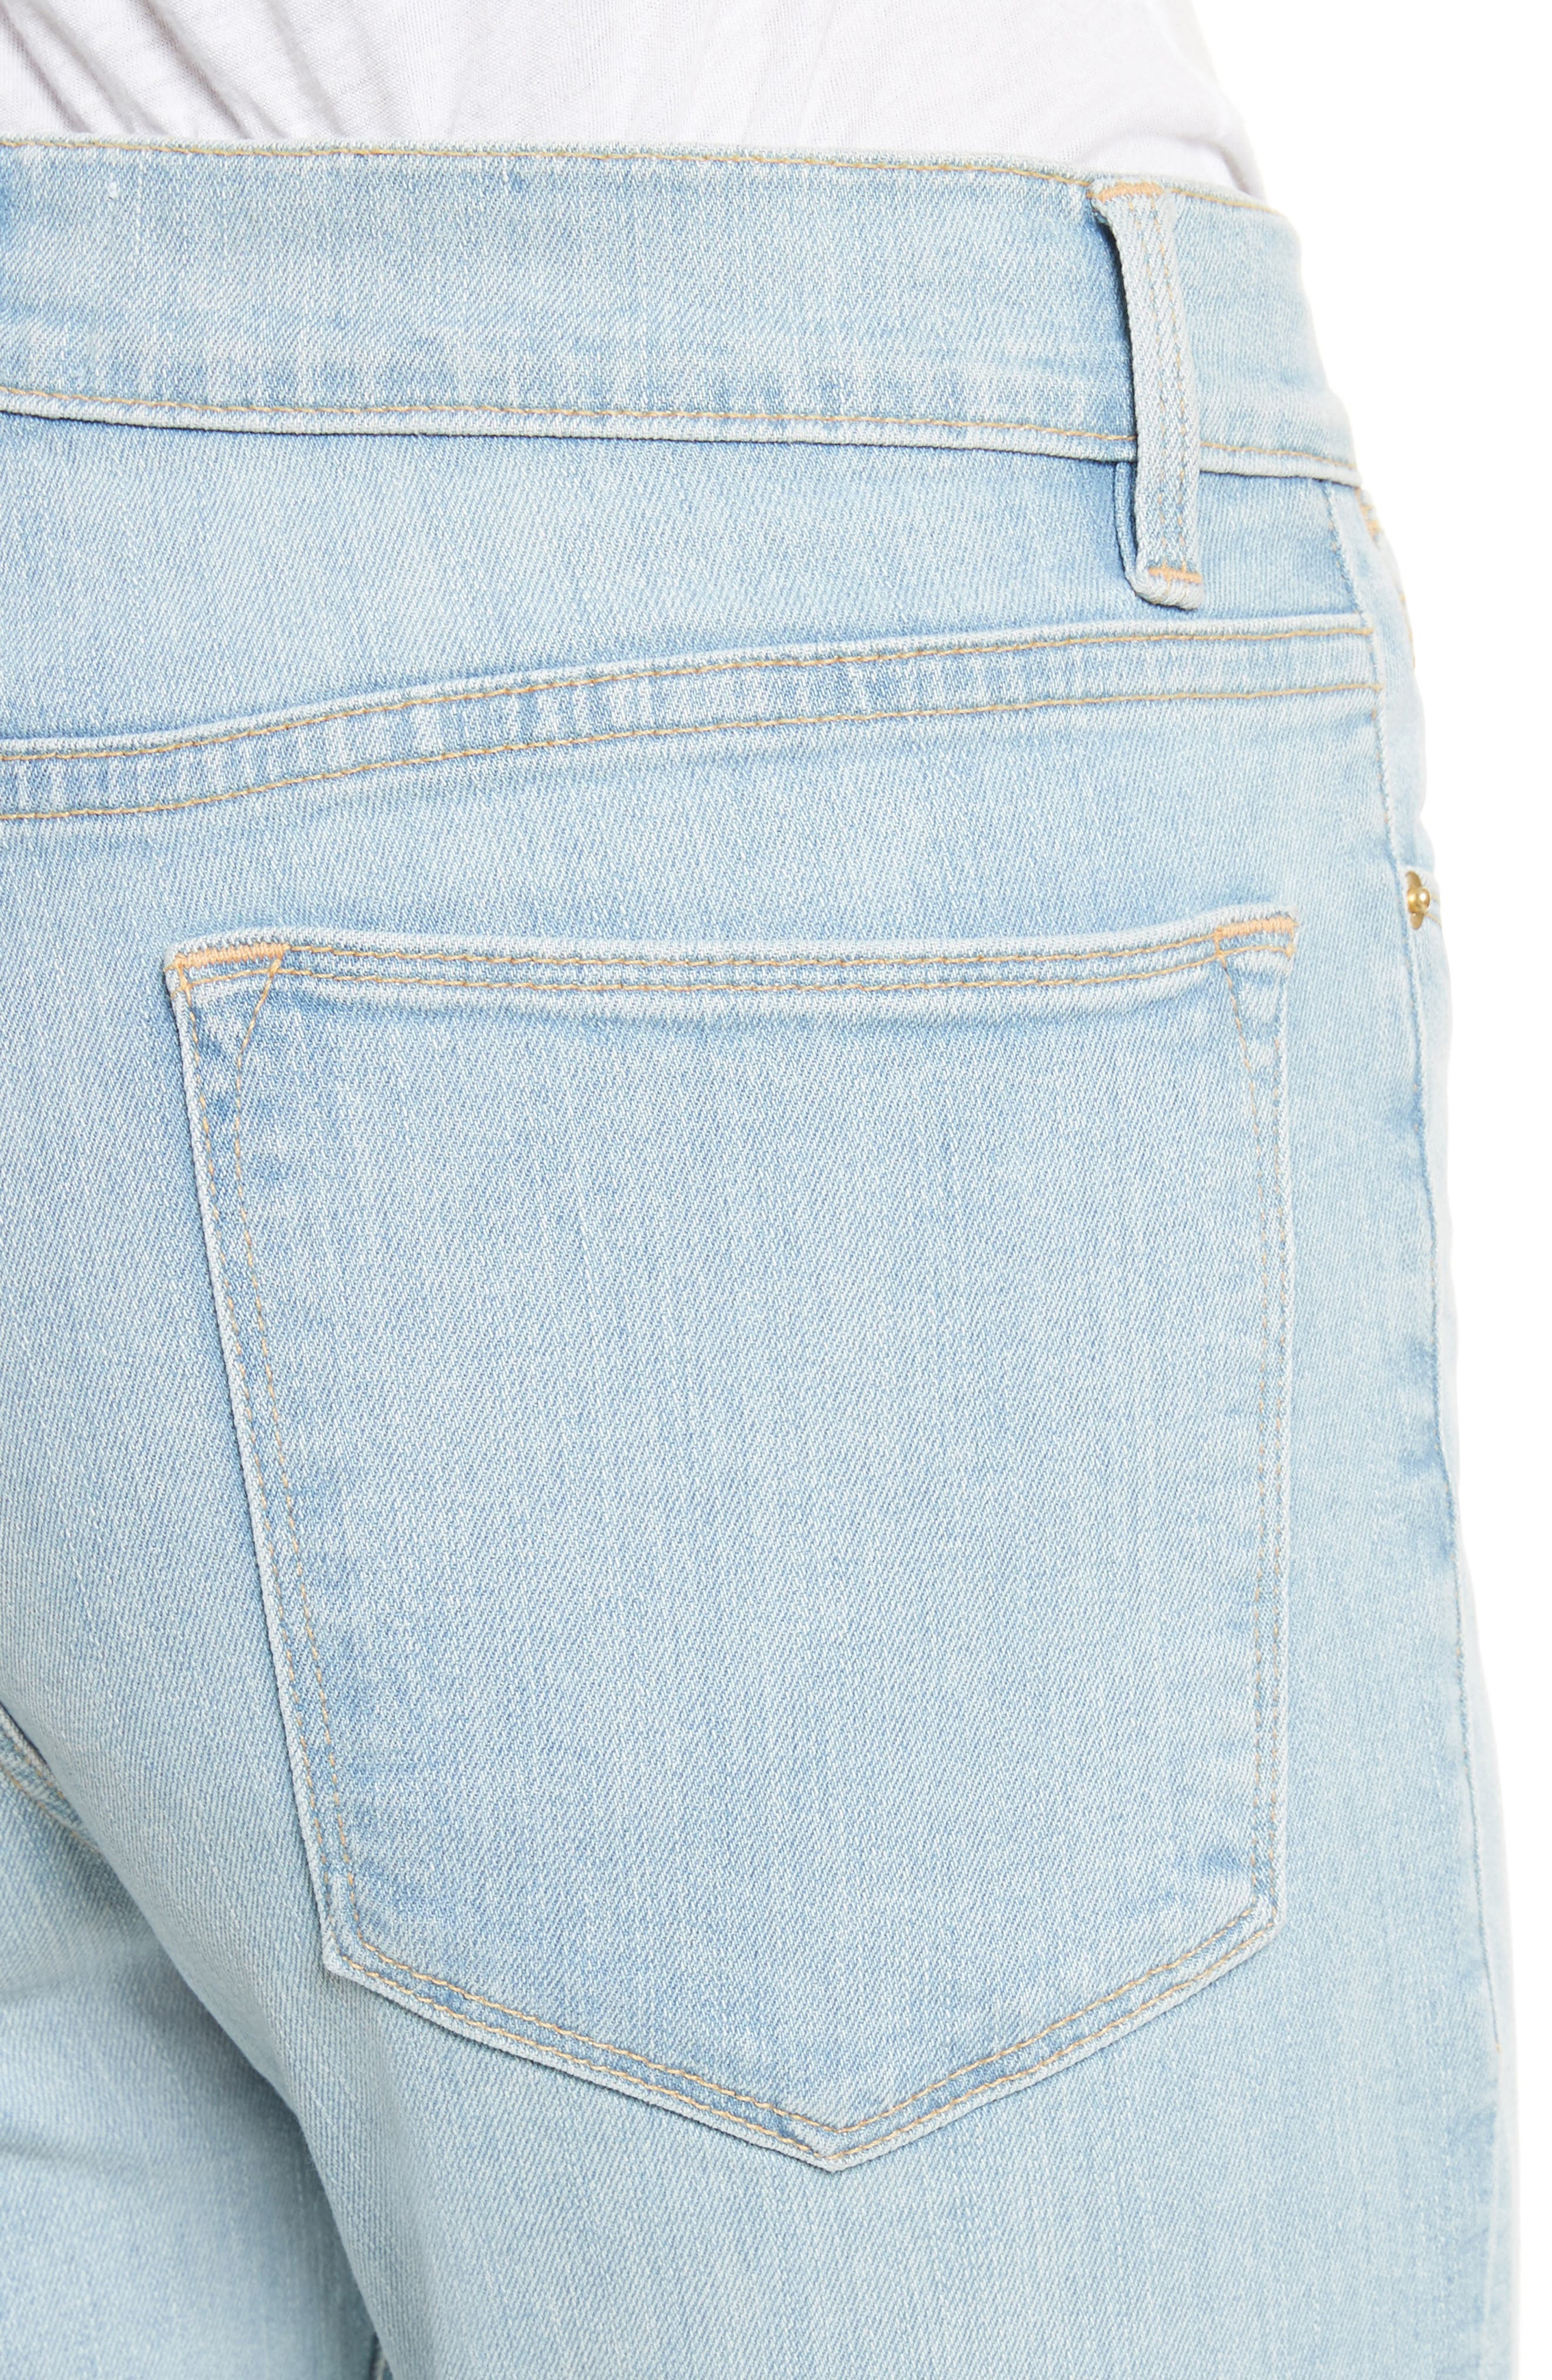 Le High Skinny Crop Jeans,                             Alternate thumbnail 5, color,                             Prospect